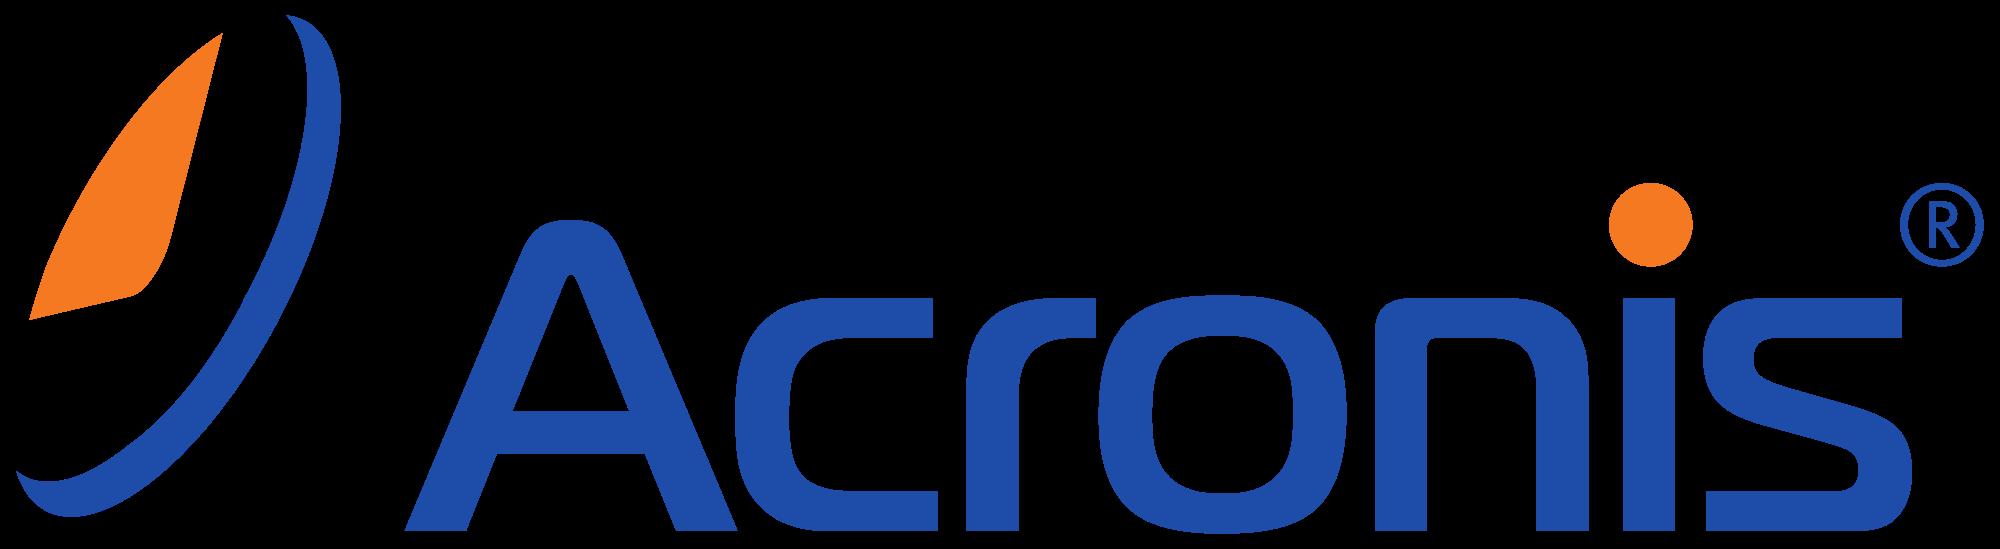 Acronis_Germany_logo.svg